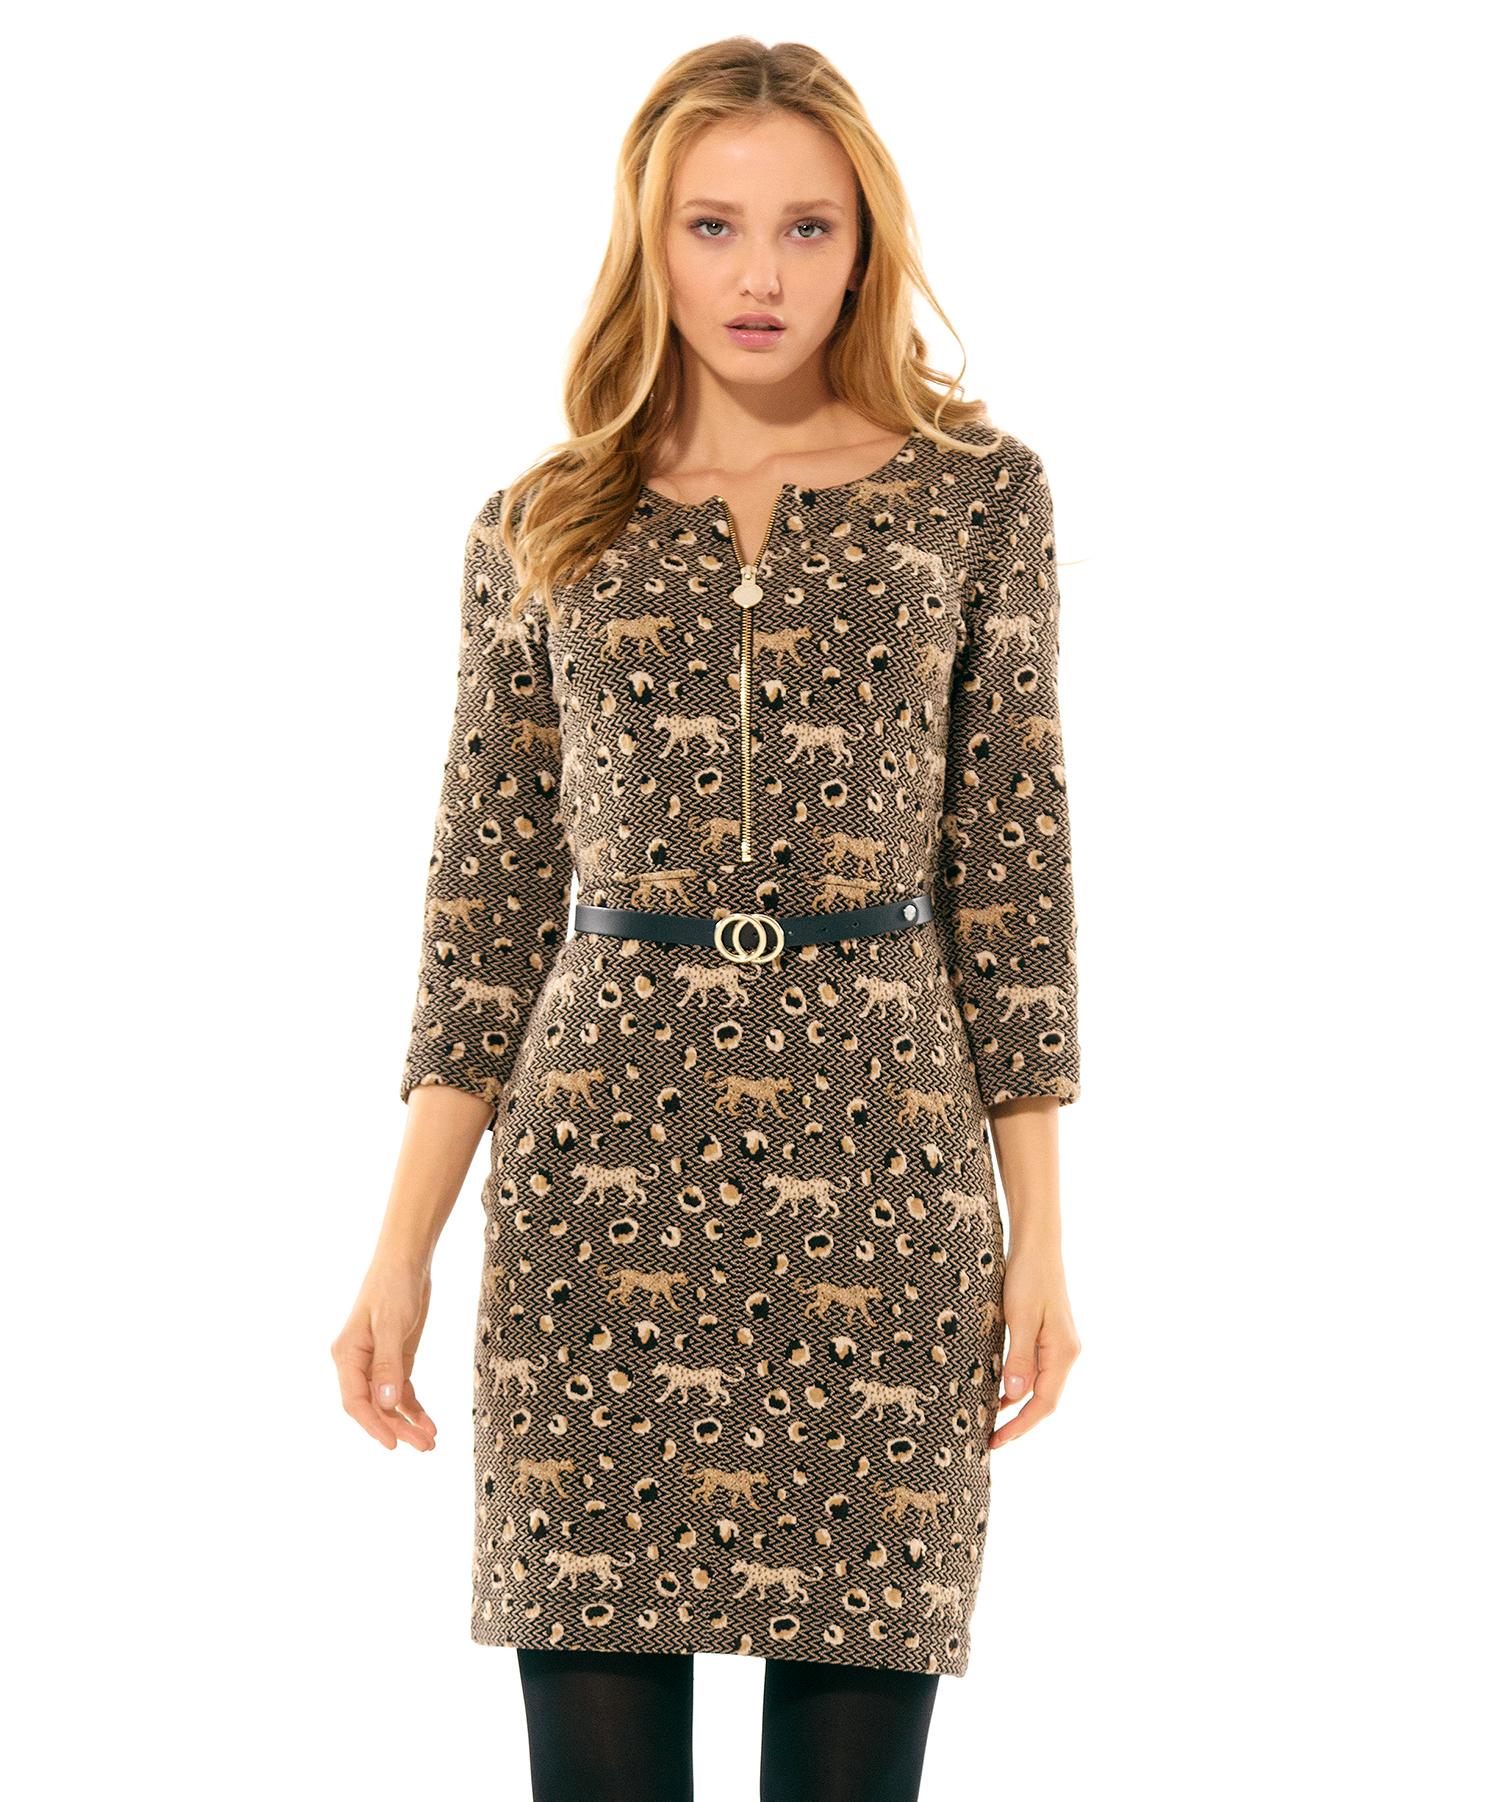 Caroline Biss jurk luipaard jacquard